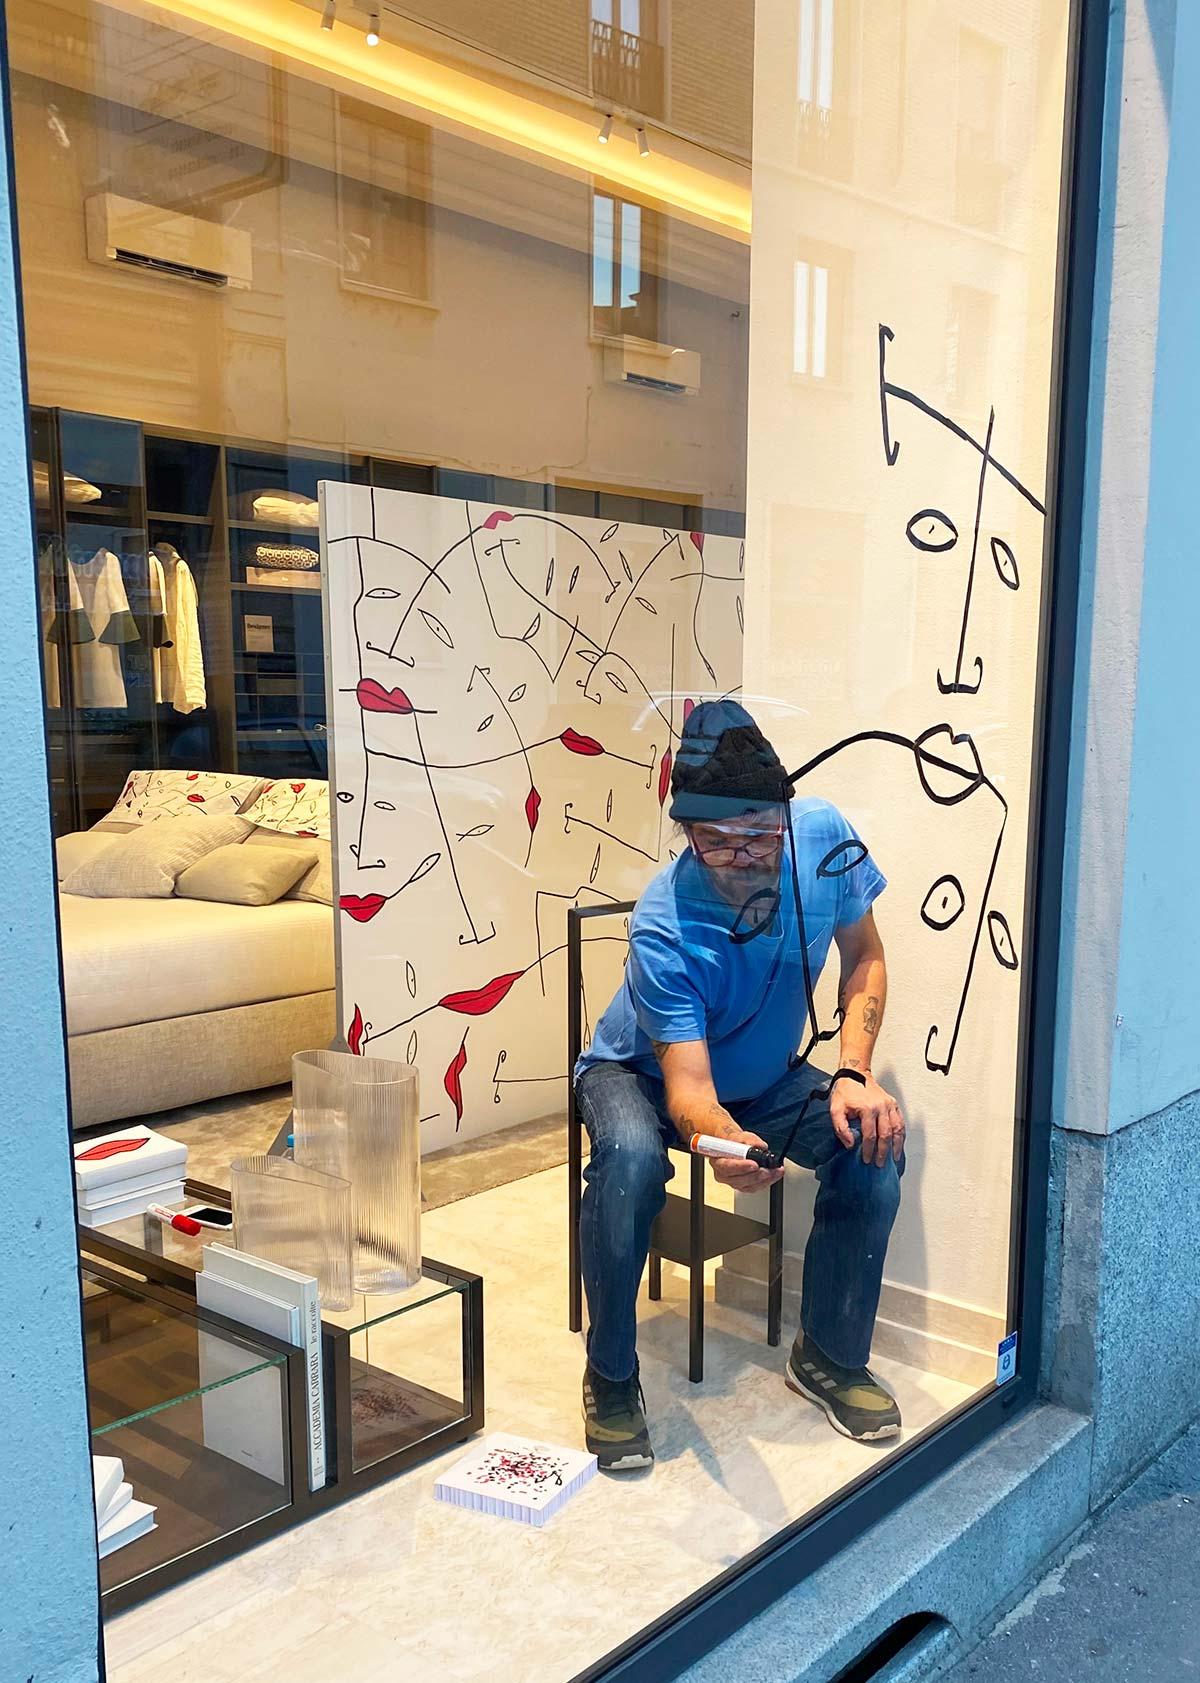 'Mood's of Bixio – le camere dell'artista', Bixio Braghieri, showroom Natevo by Flou